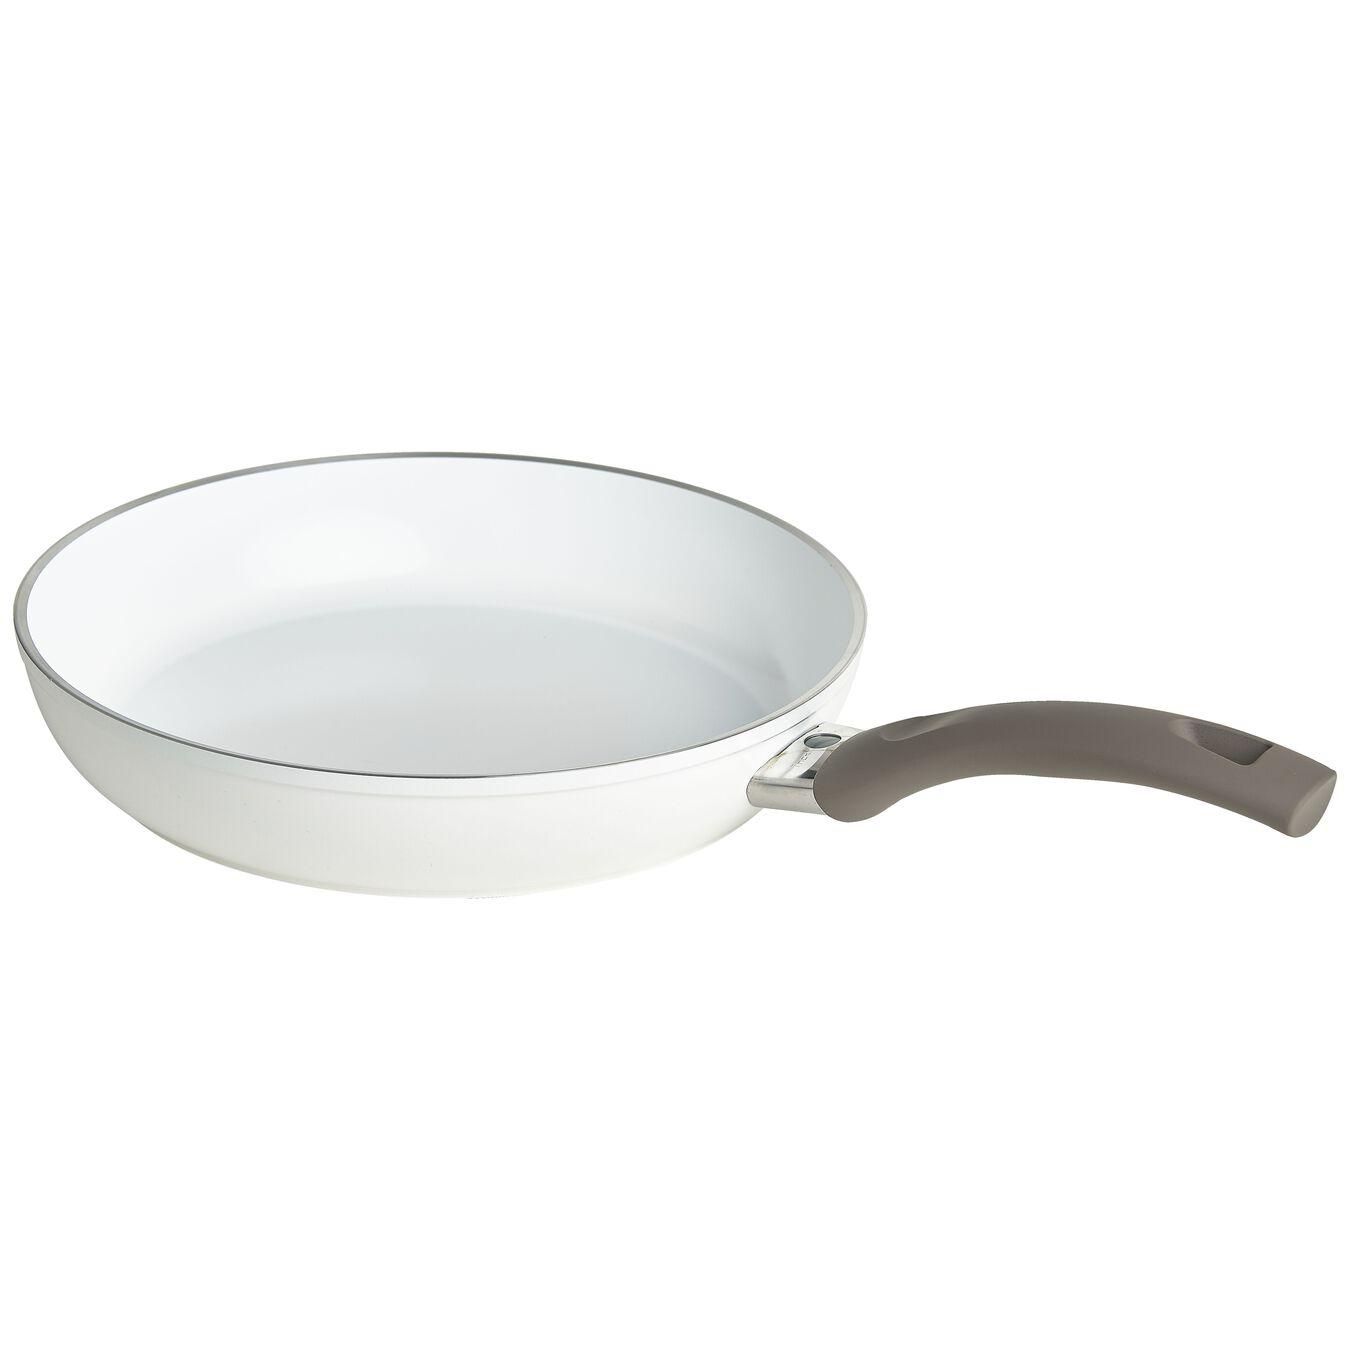 Bratpfanne flach 28 cm, Aluminium, Weiß,,large 1